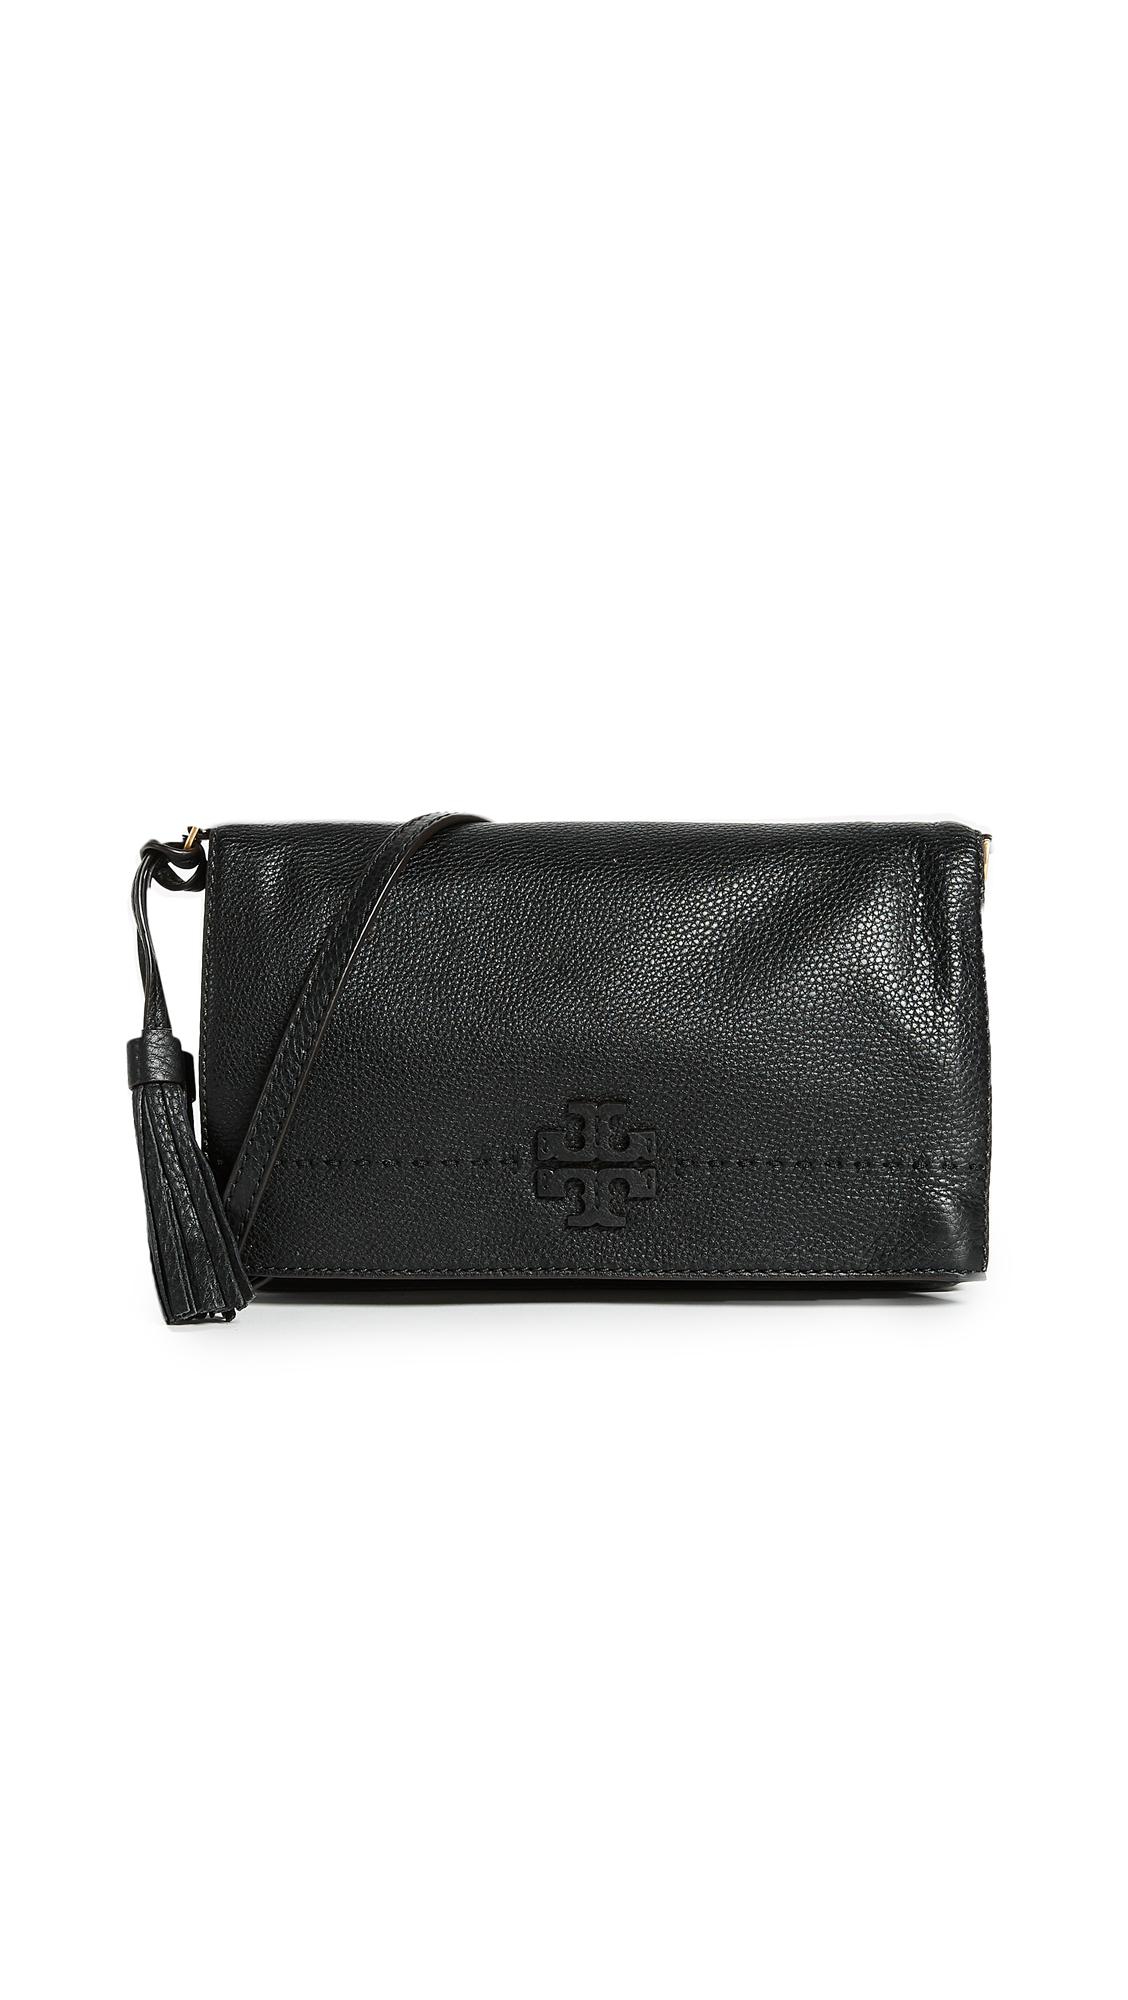 Tory Burch McGraw Fold Over Cross Body Bag - Black